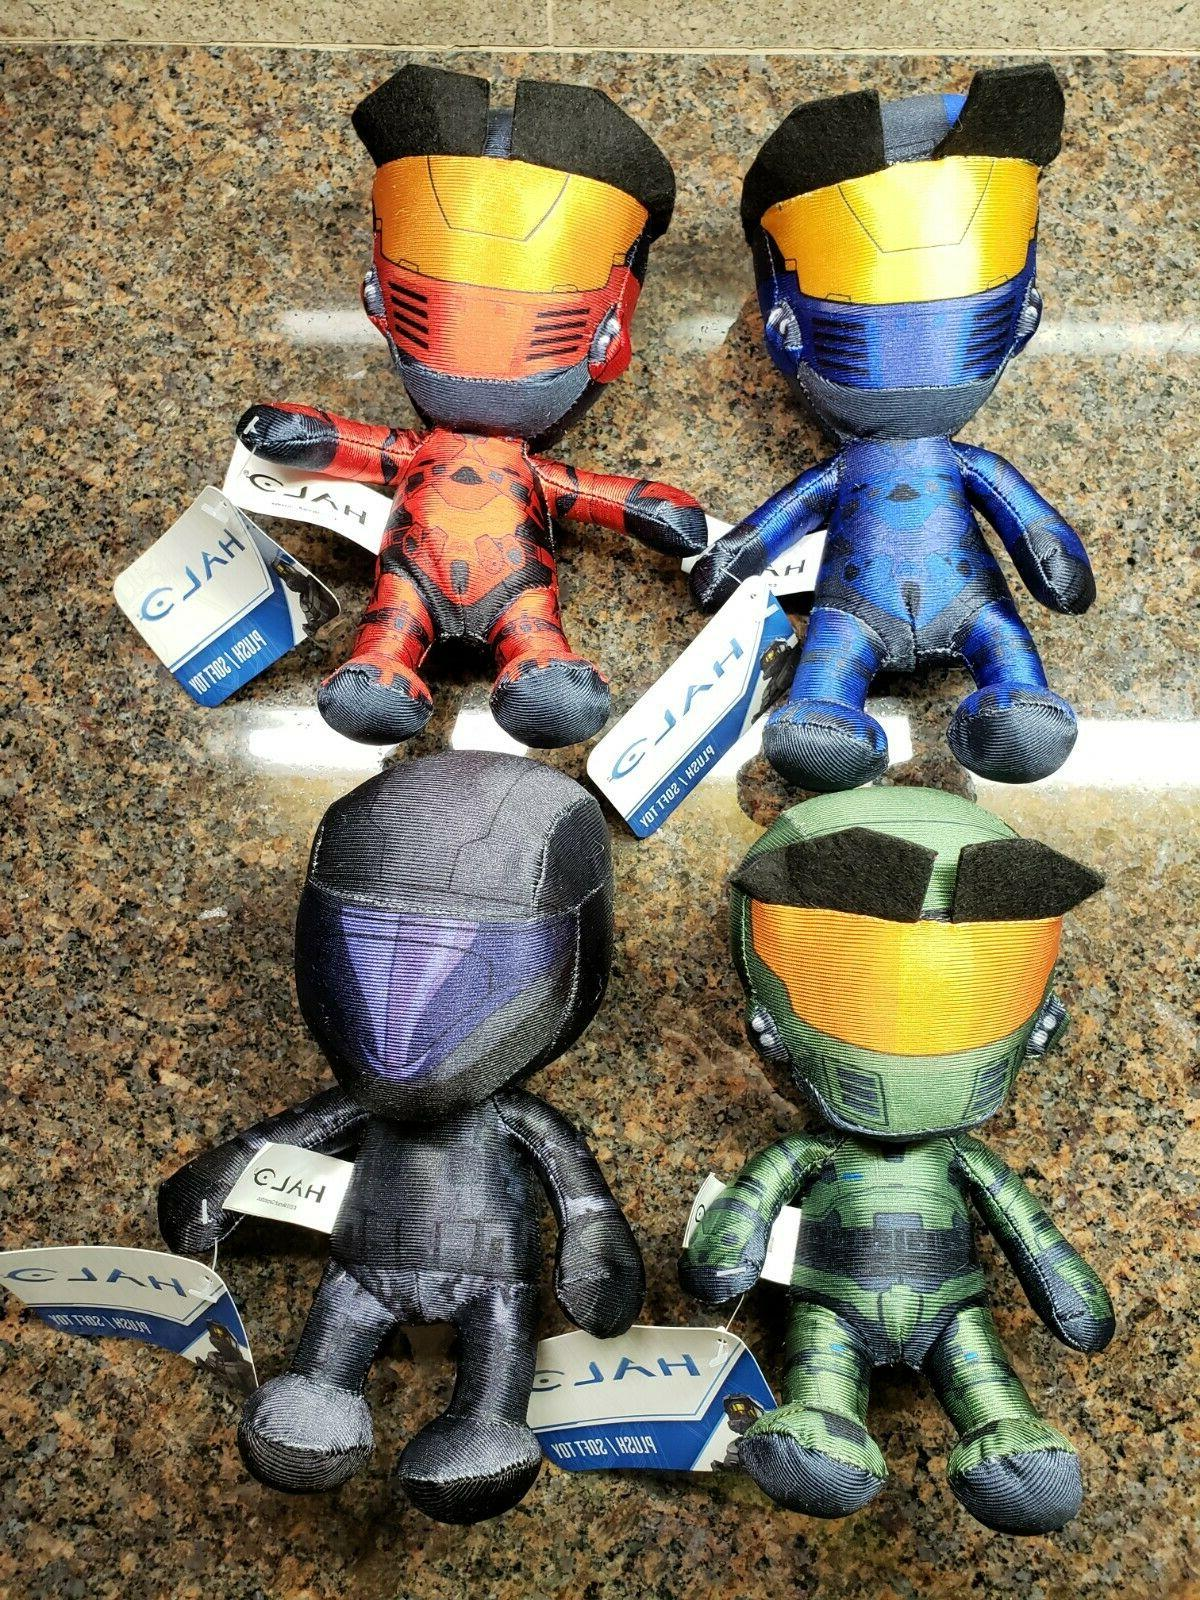 new halo plush set toy doll figures